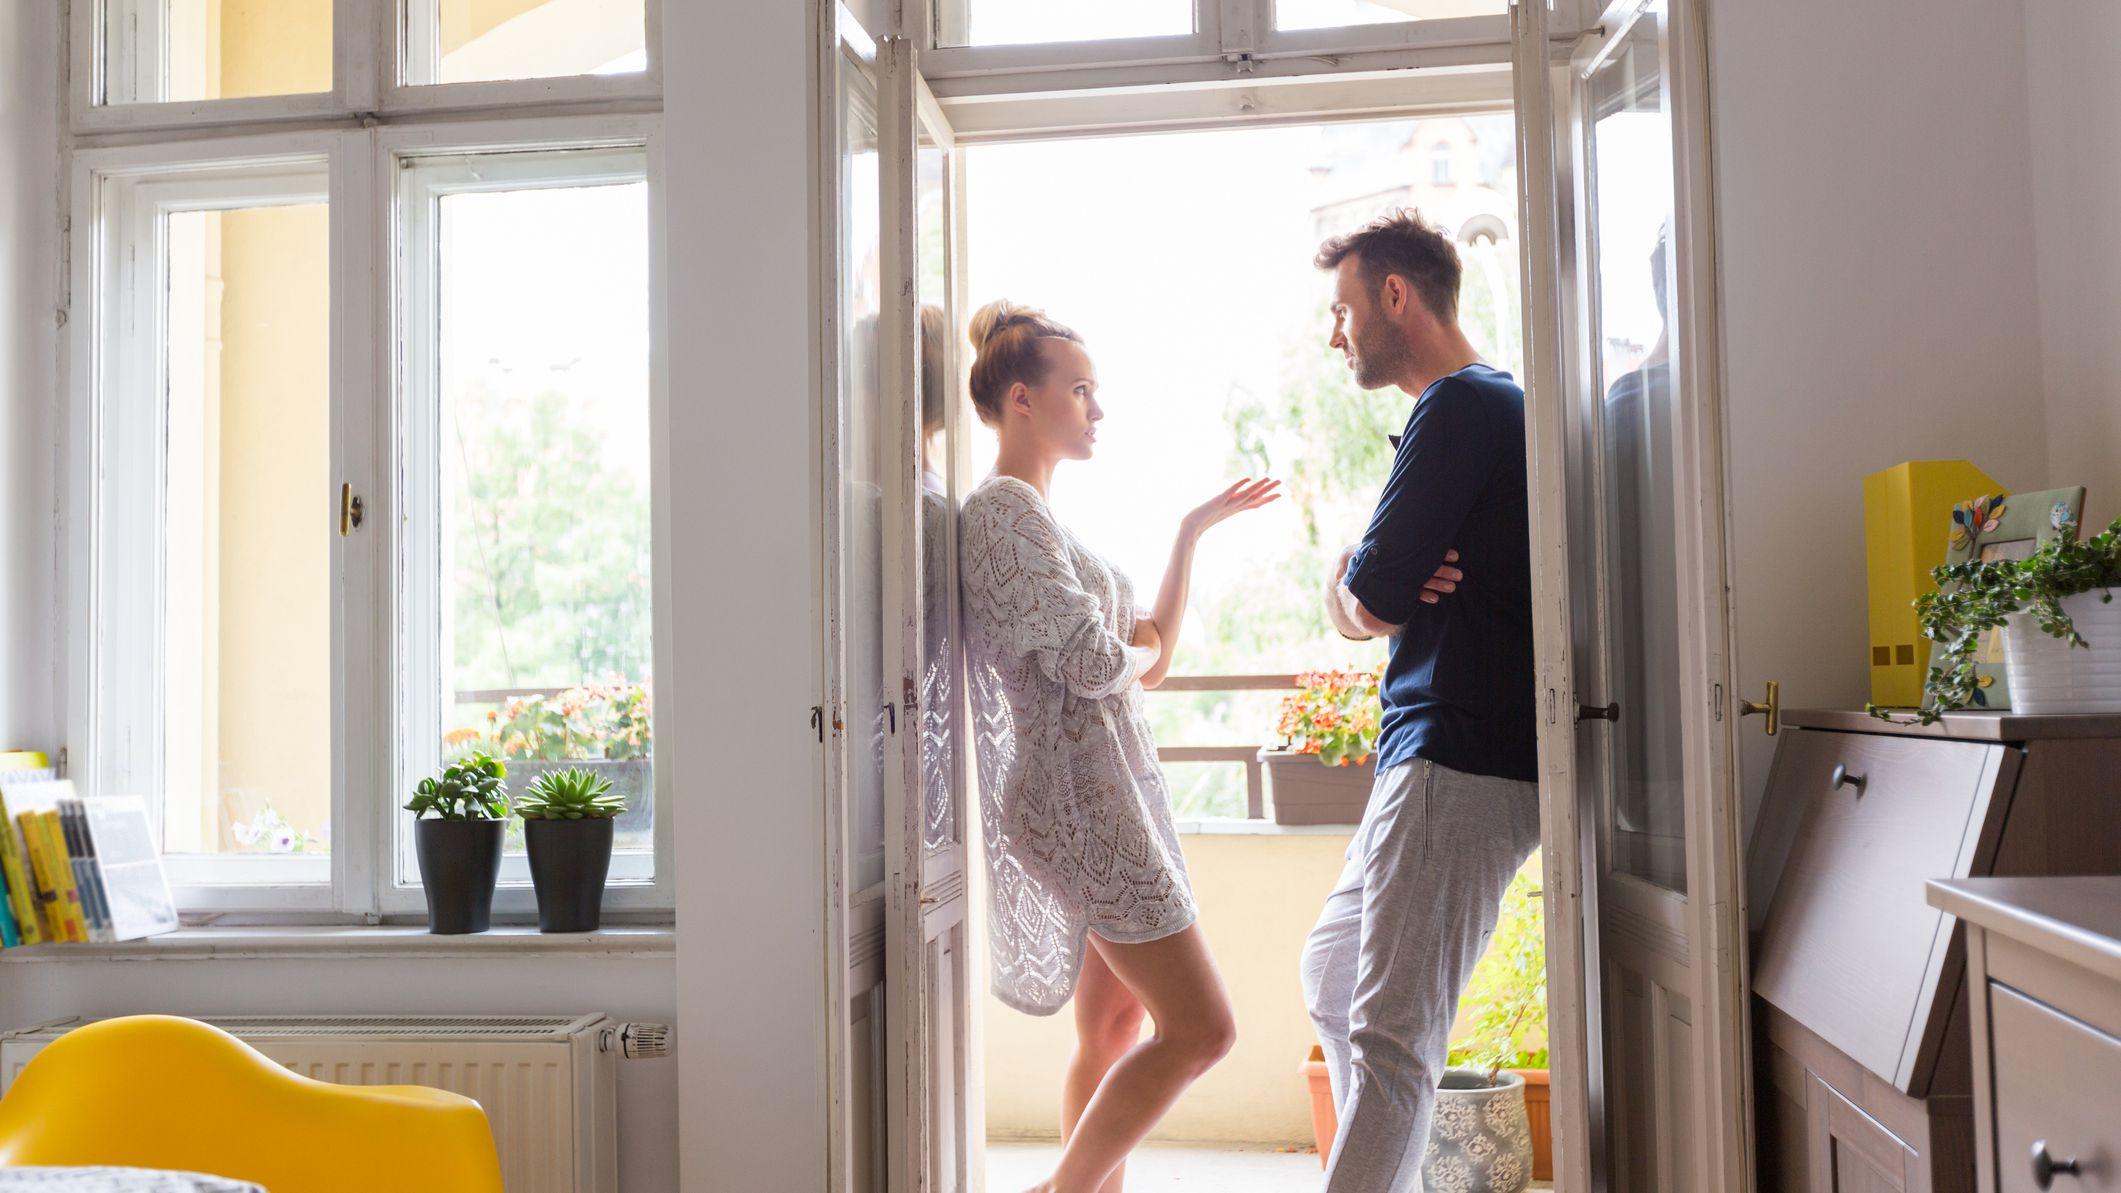 Emotional abuse by female partner